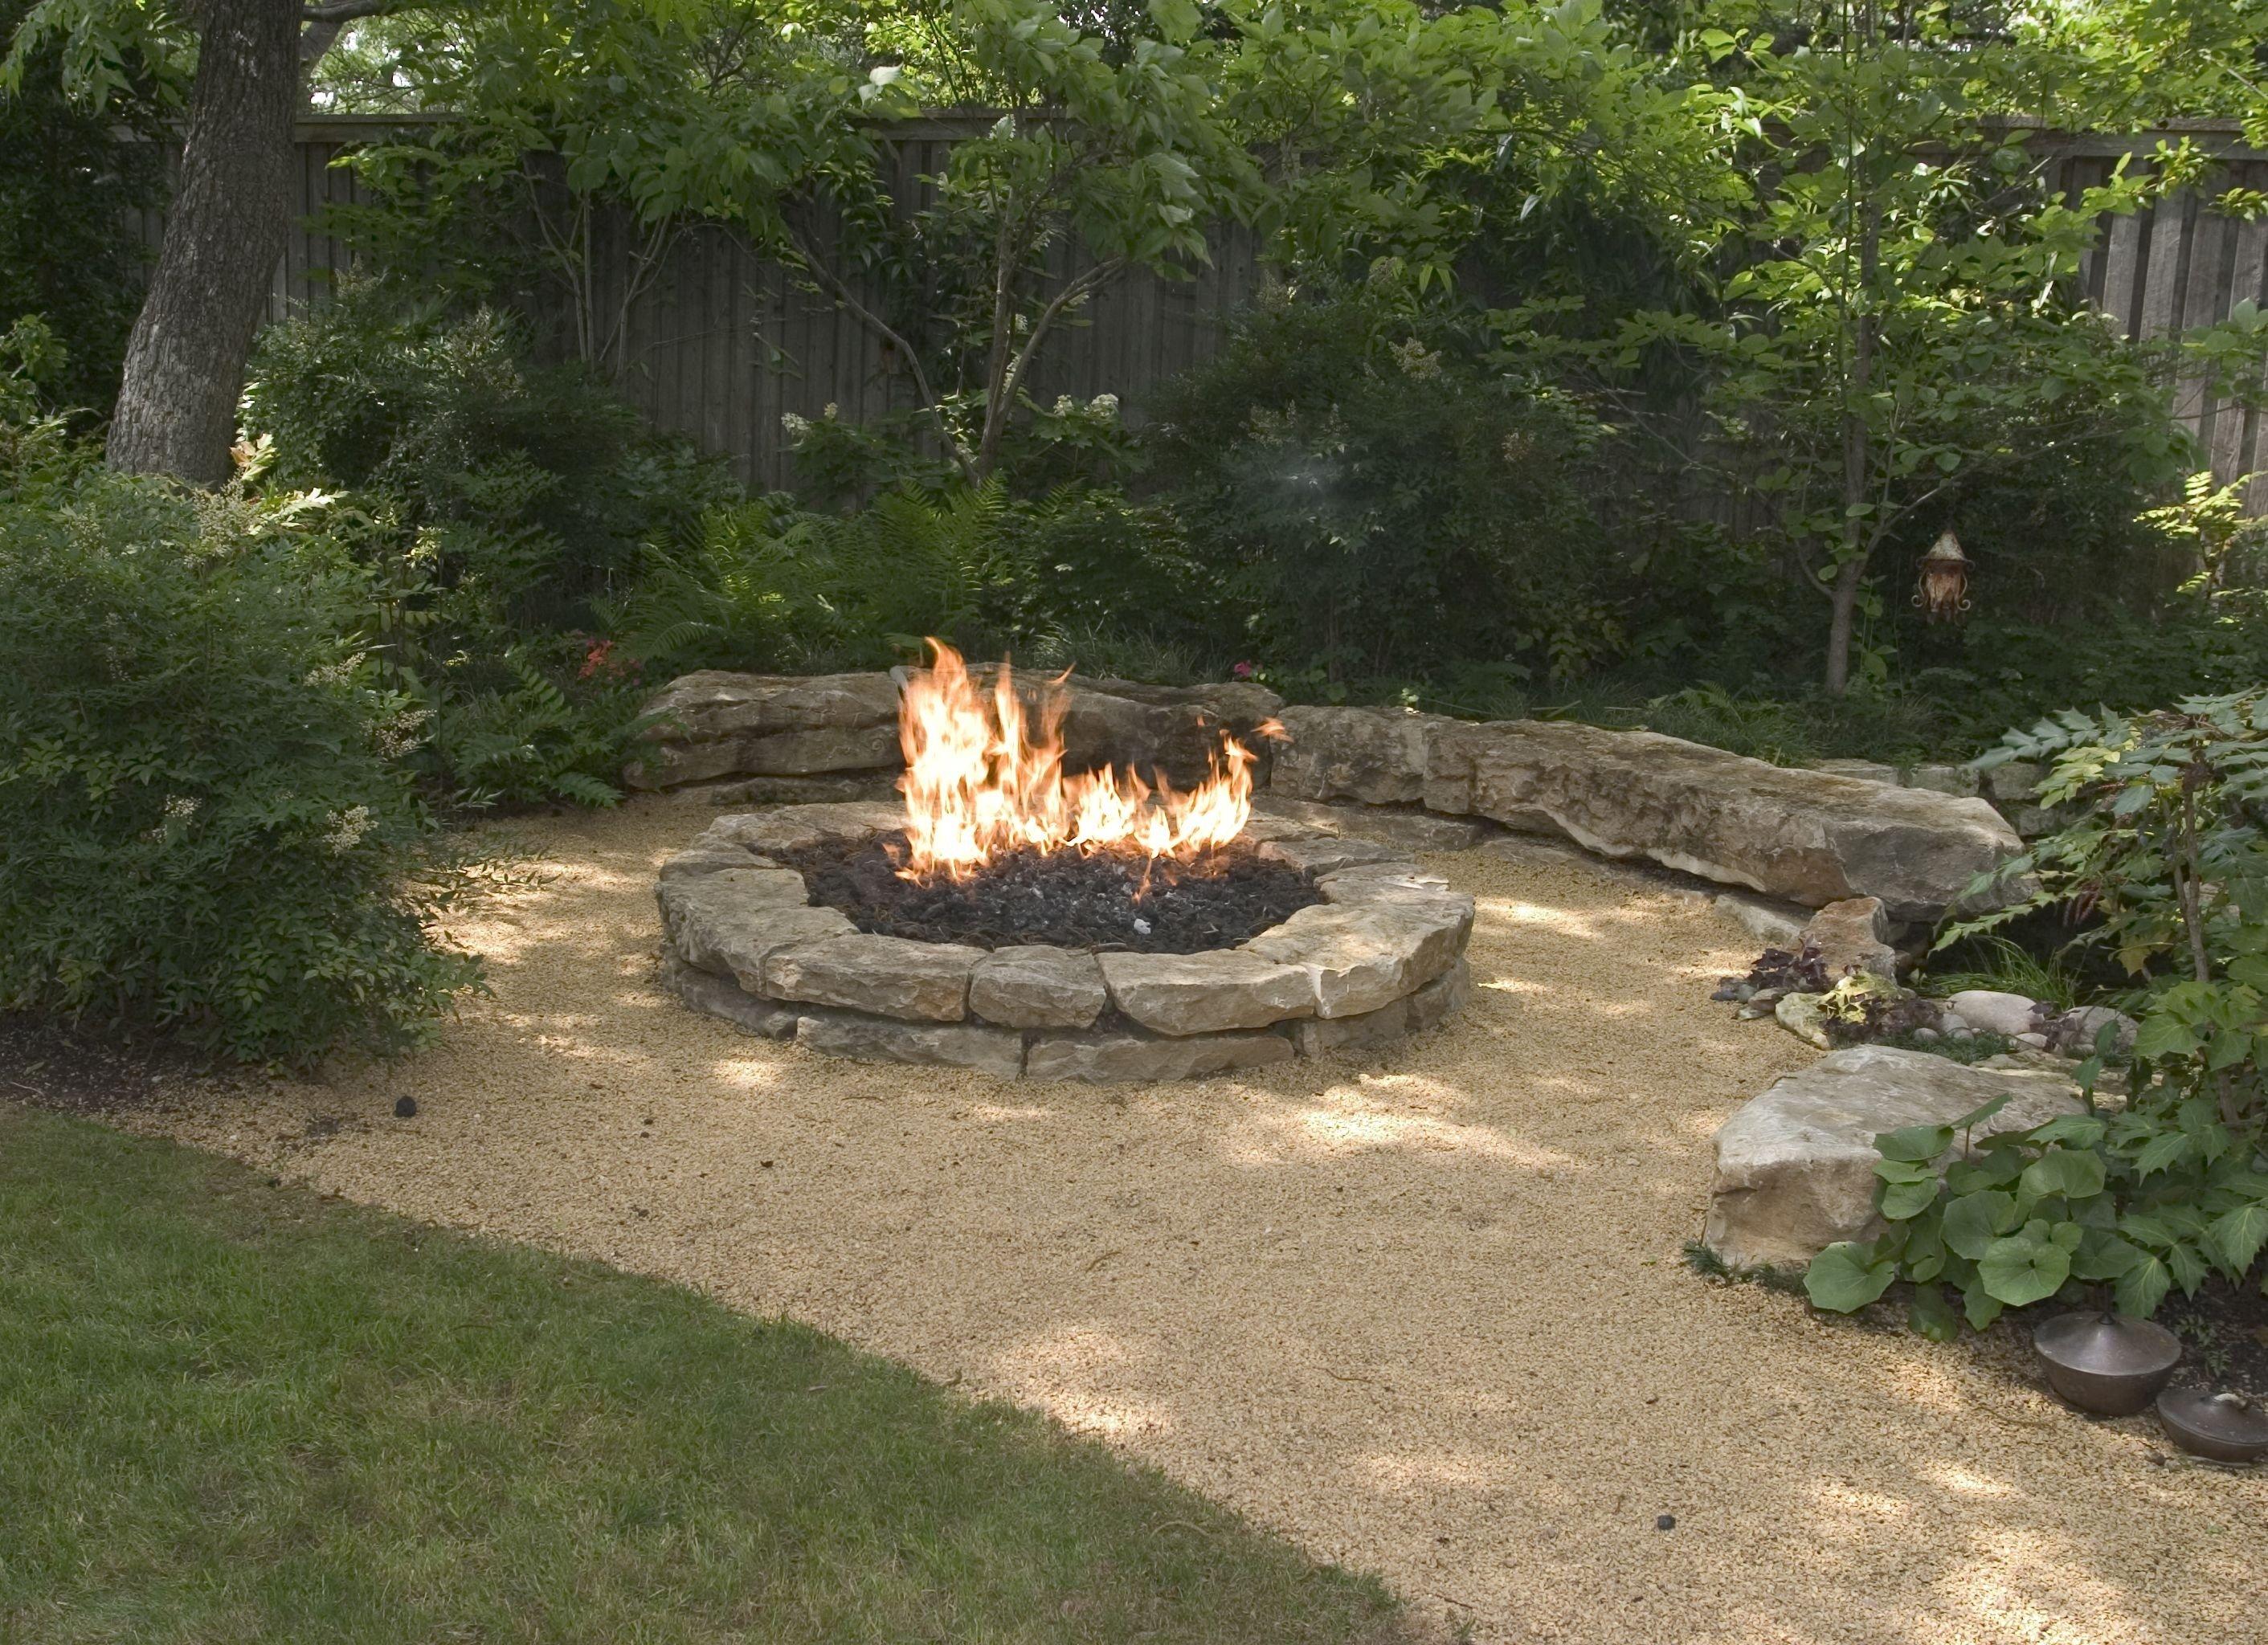 10 Great Outdoor Fire Pit Ideas Backyard backyard landscaping ideas attractive fire pit designs fire pit 1 2020